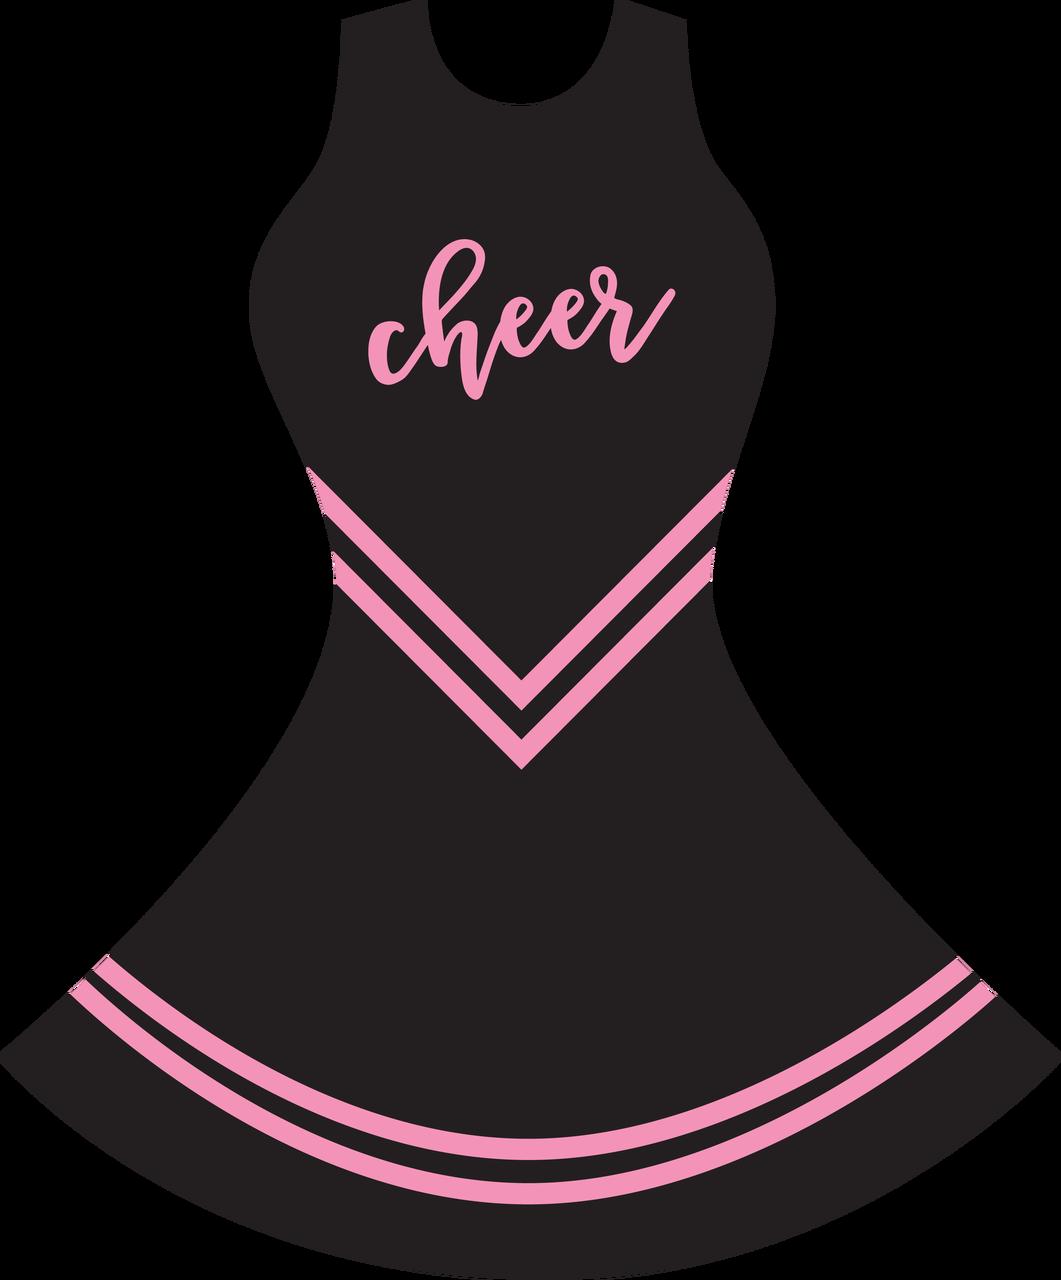 Cheer Uniform SVG Cut File